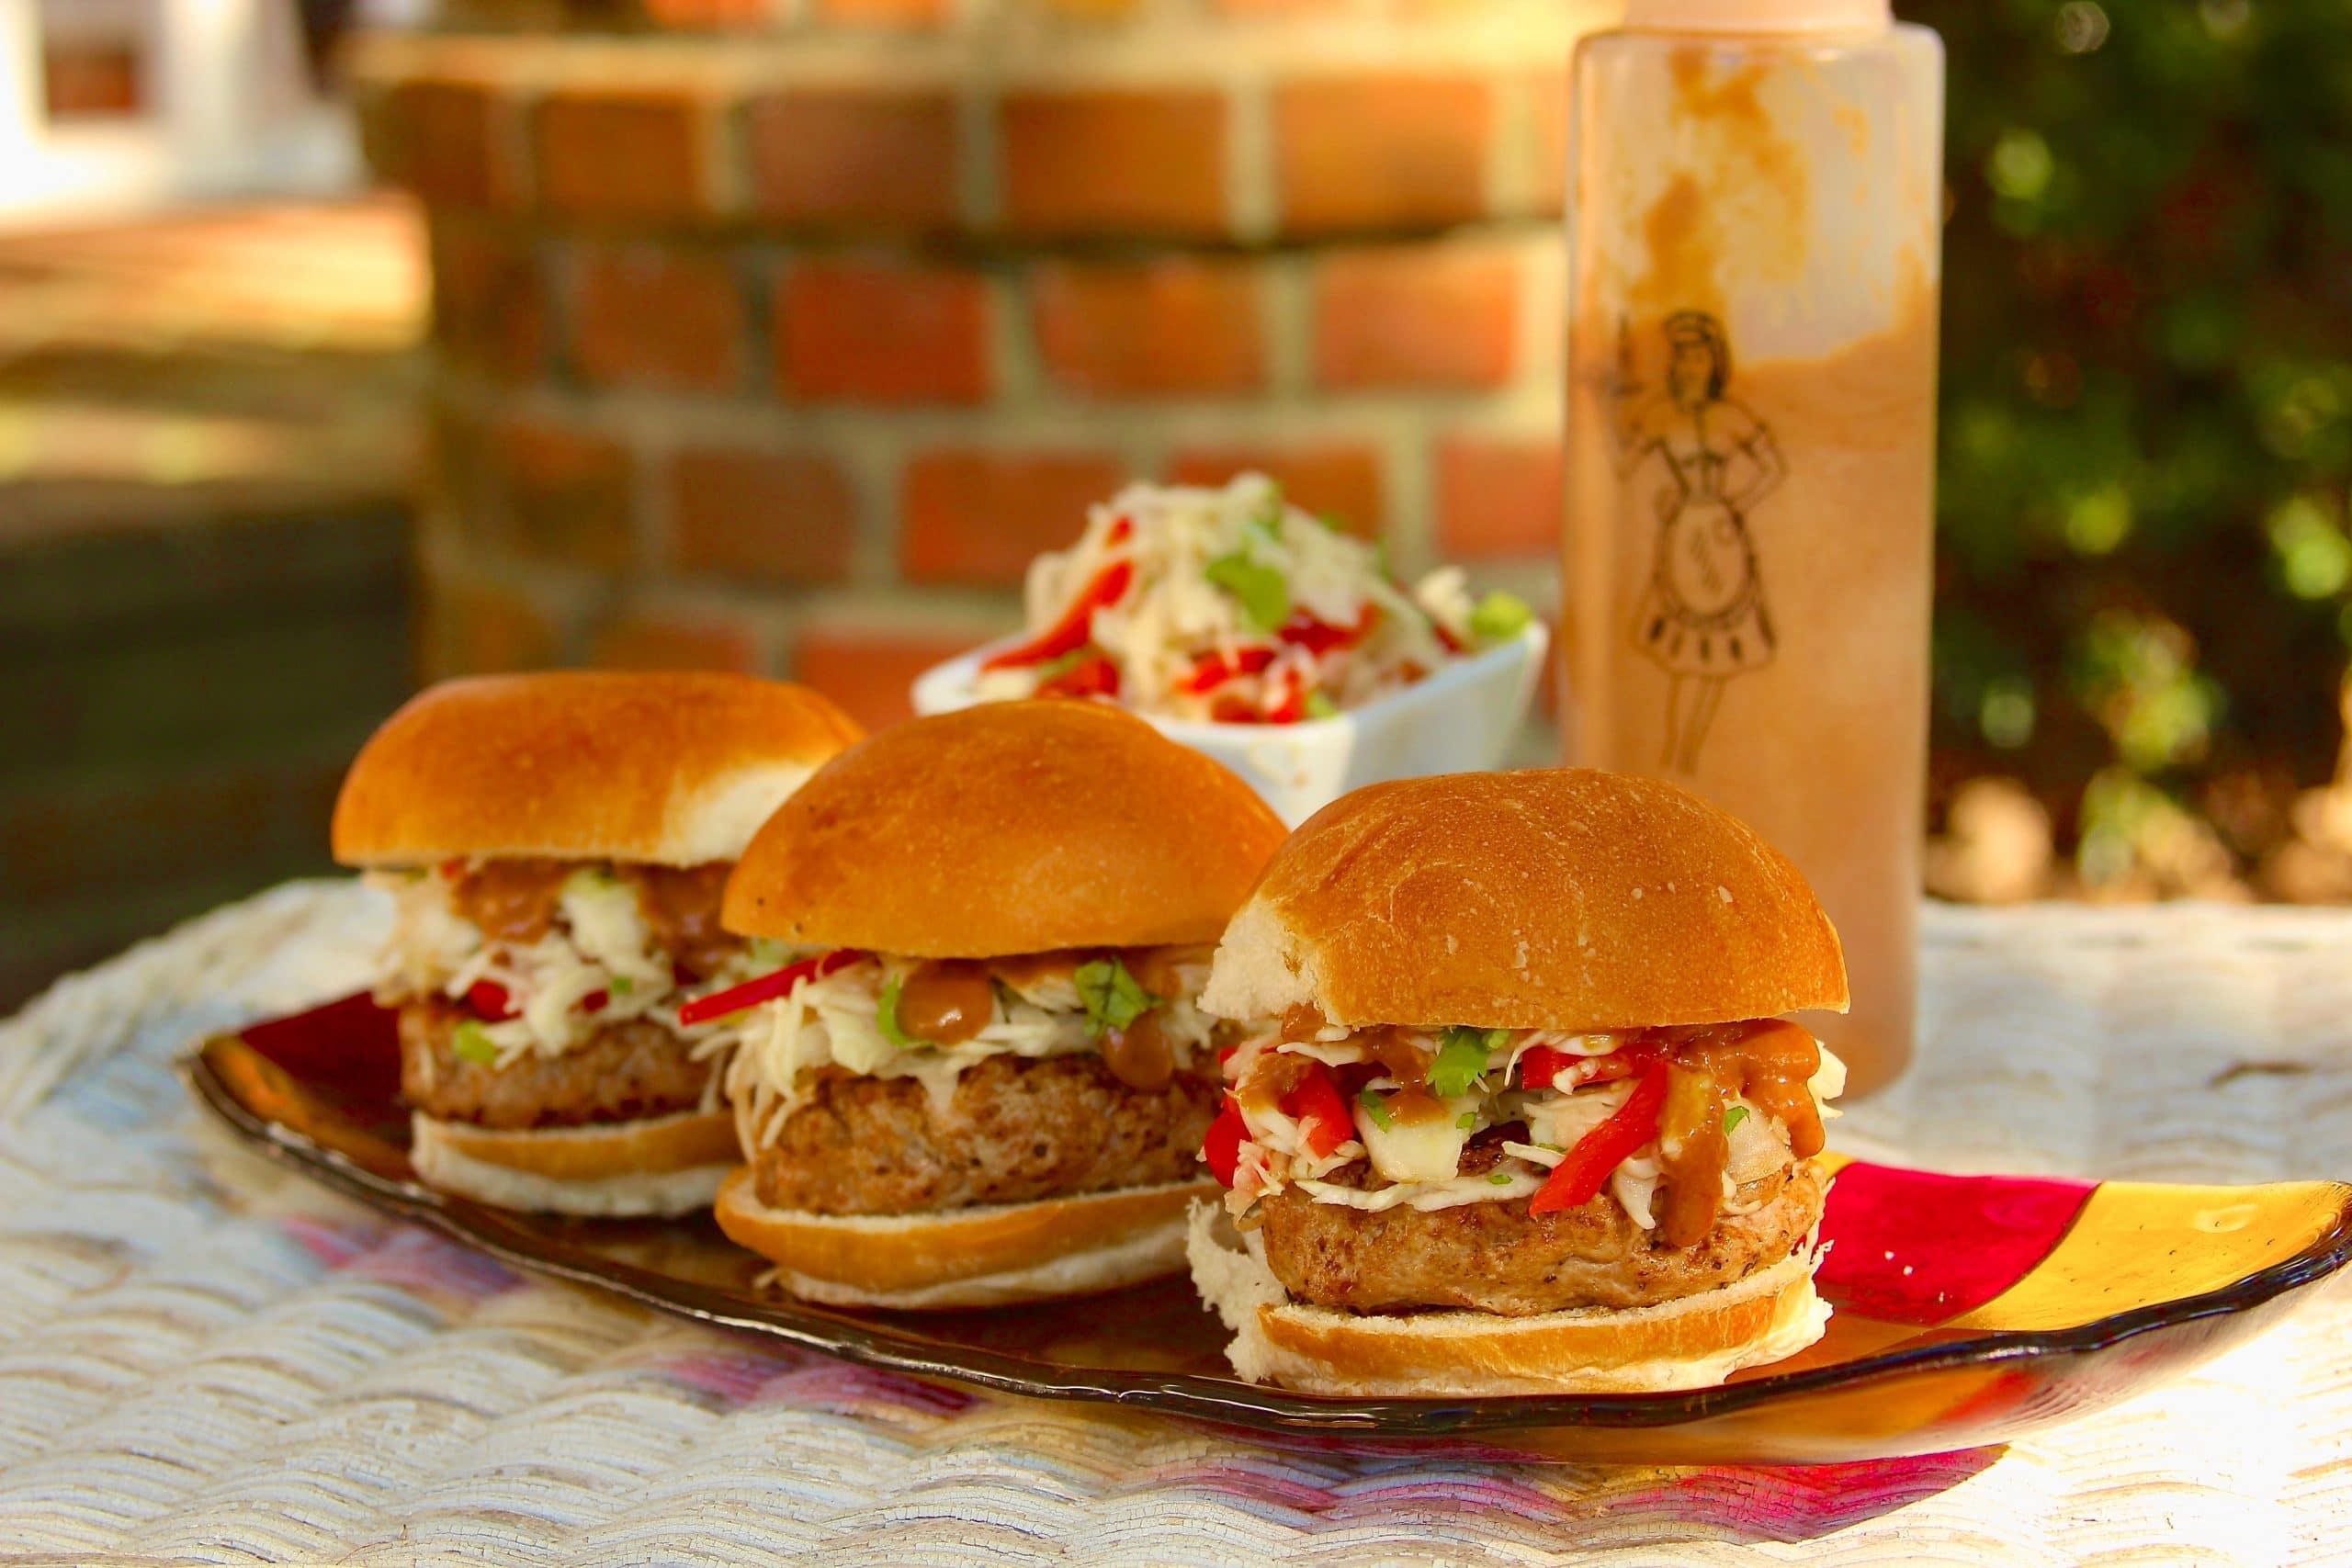 Pork satay burger sliders on a tray